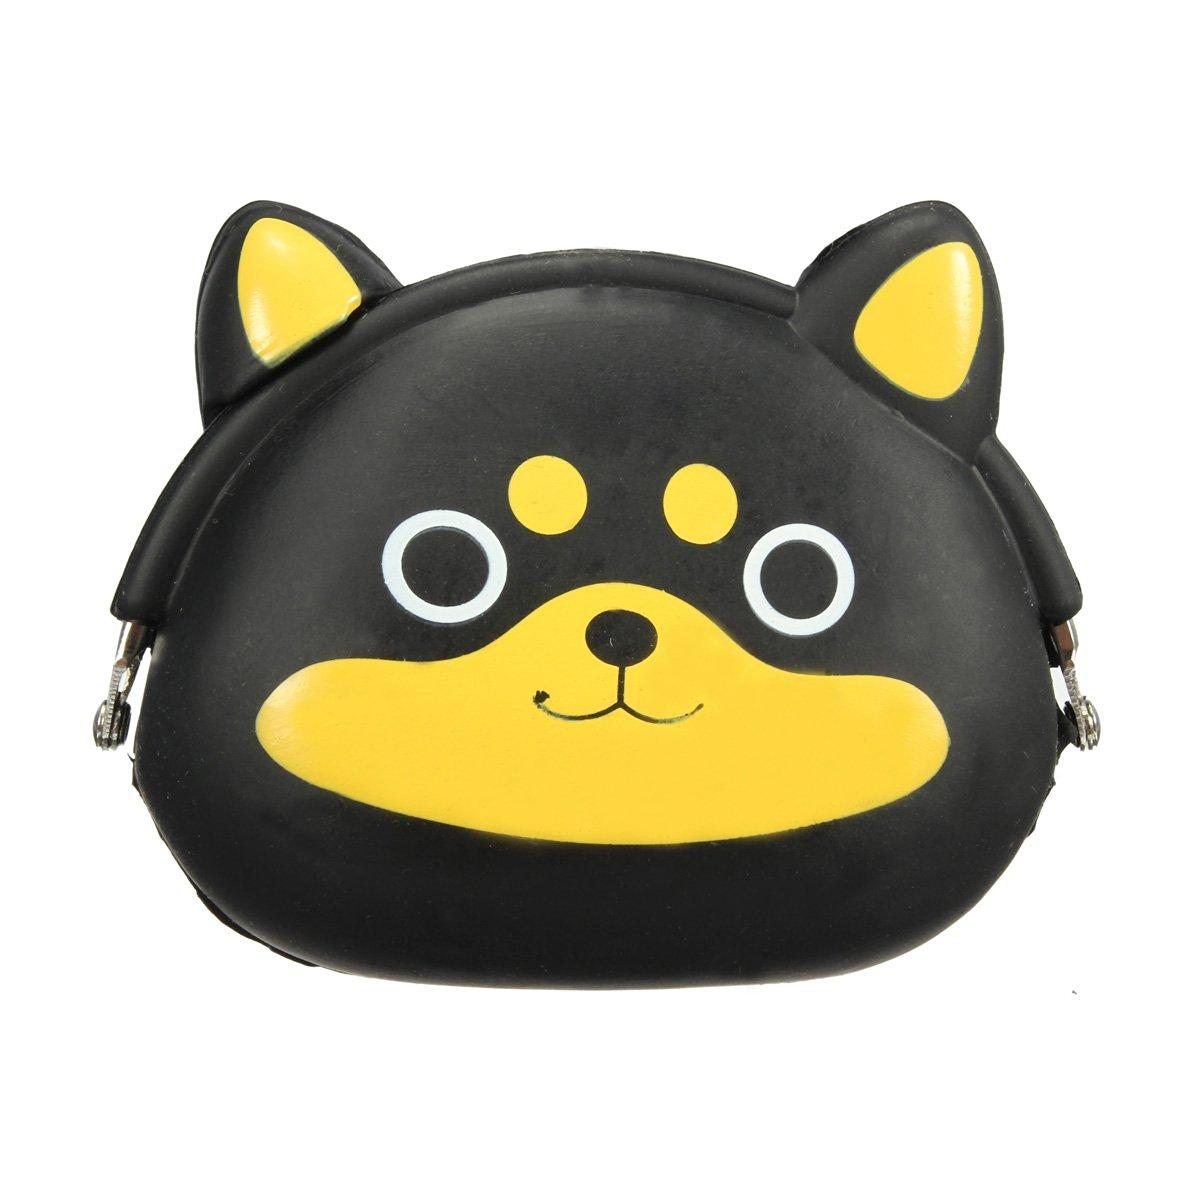 5pcs of Women Girls Wallet Kawaii Cute Cartoon Animal Silicone Jelly Coin Bag Purse Kids Gift Huskies